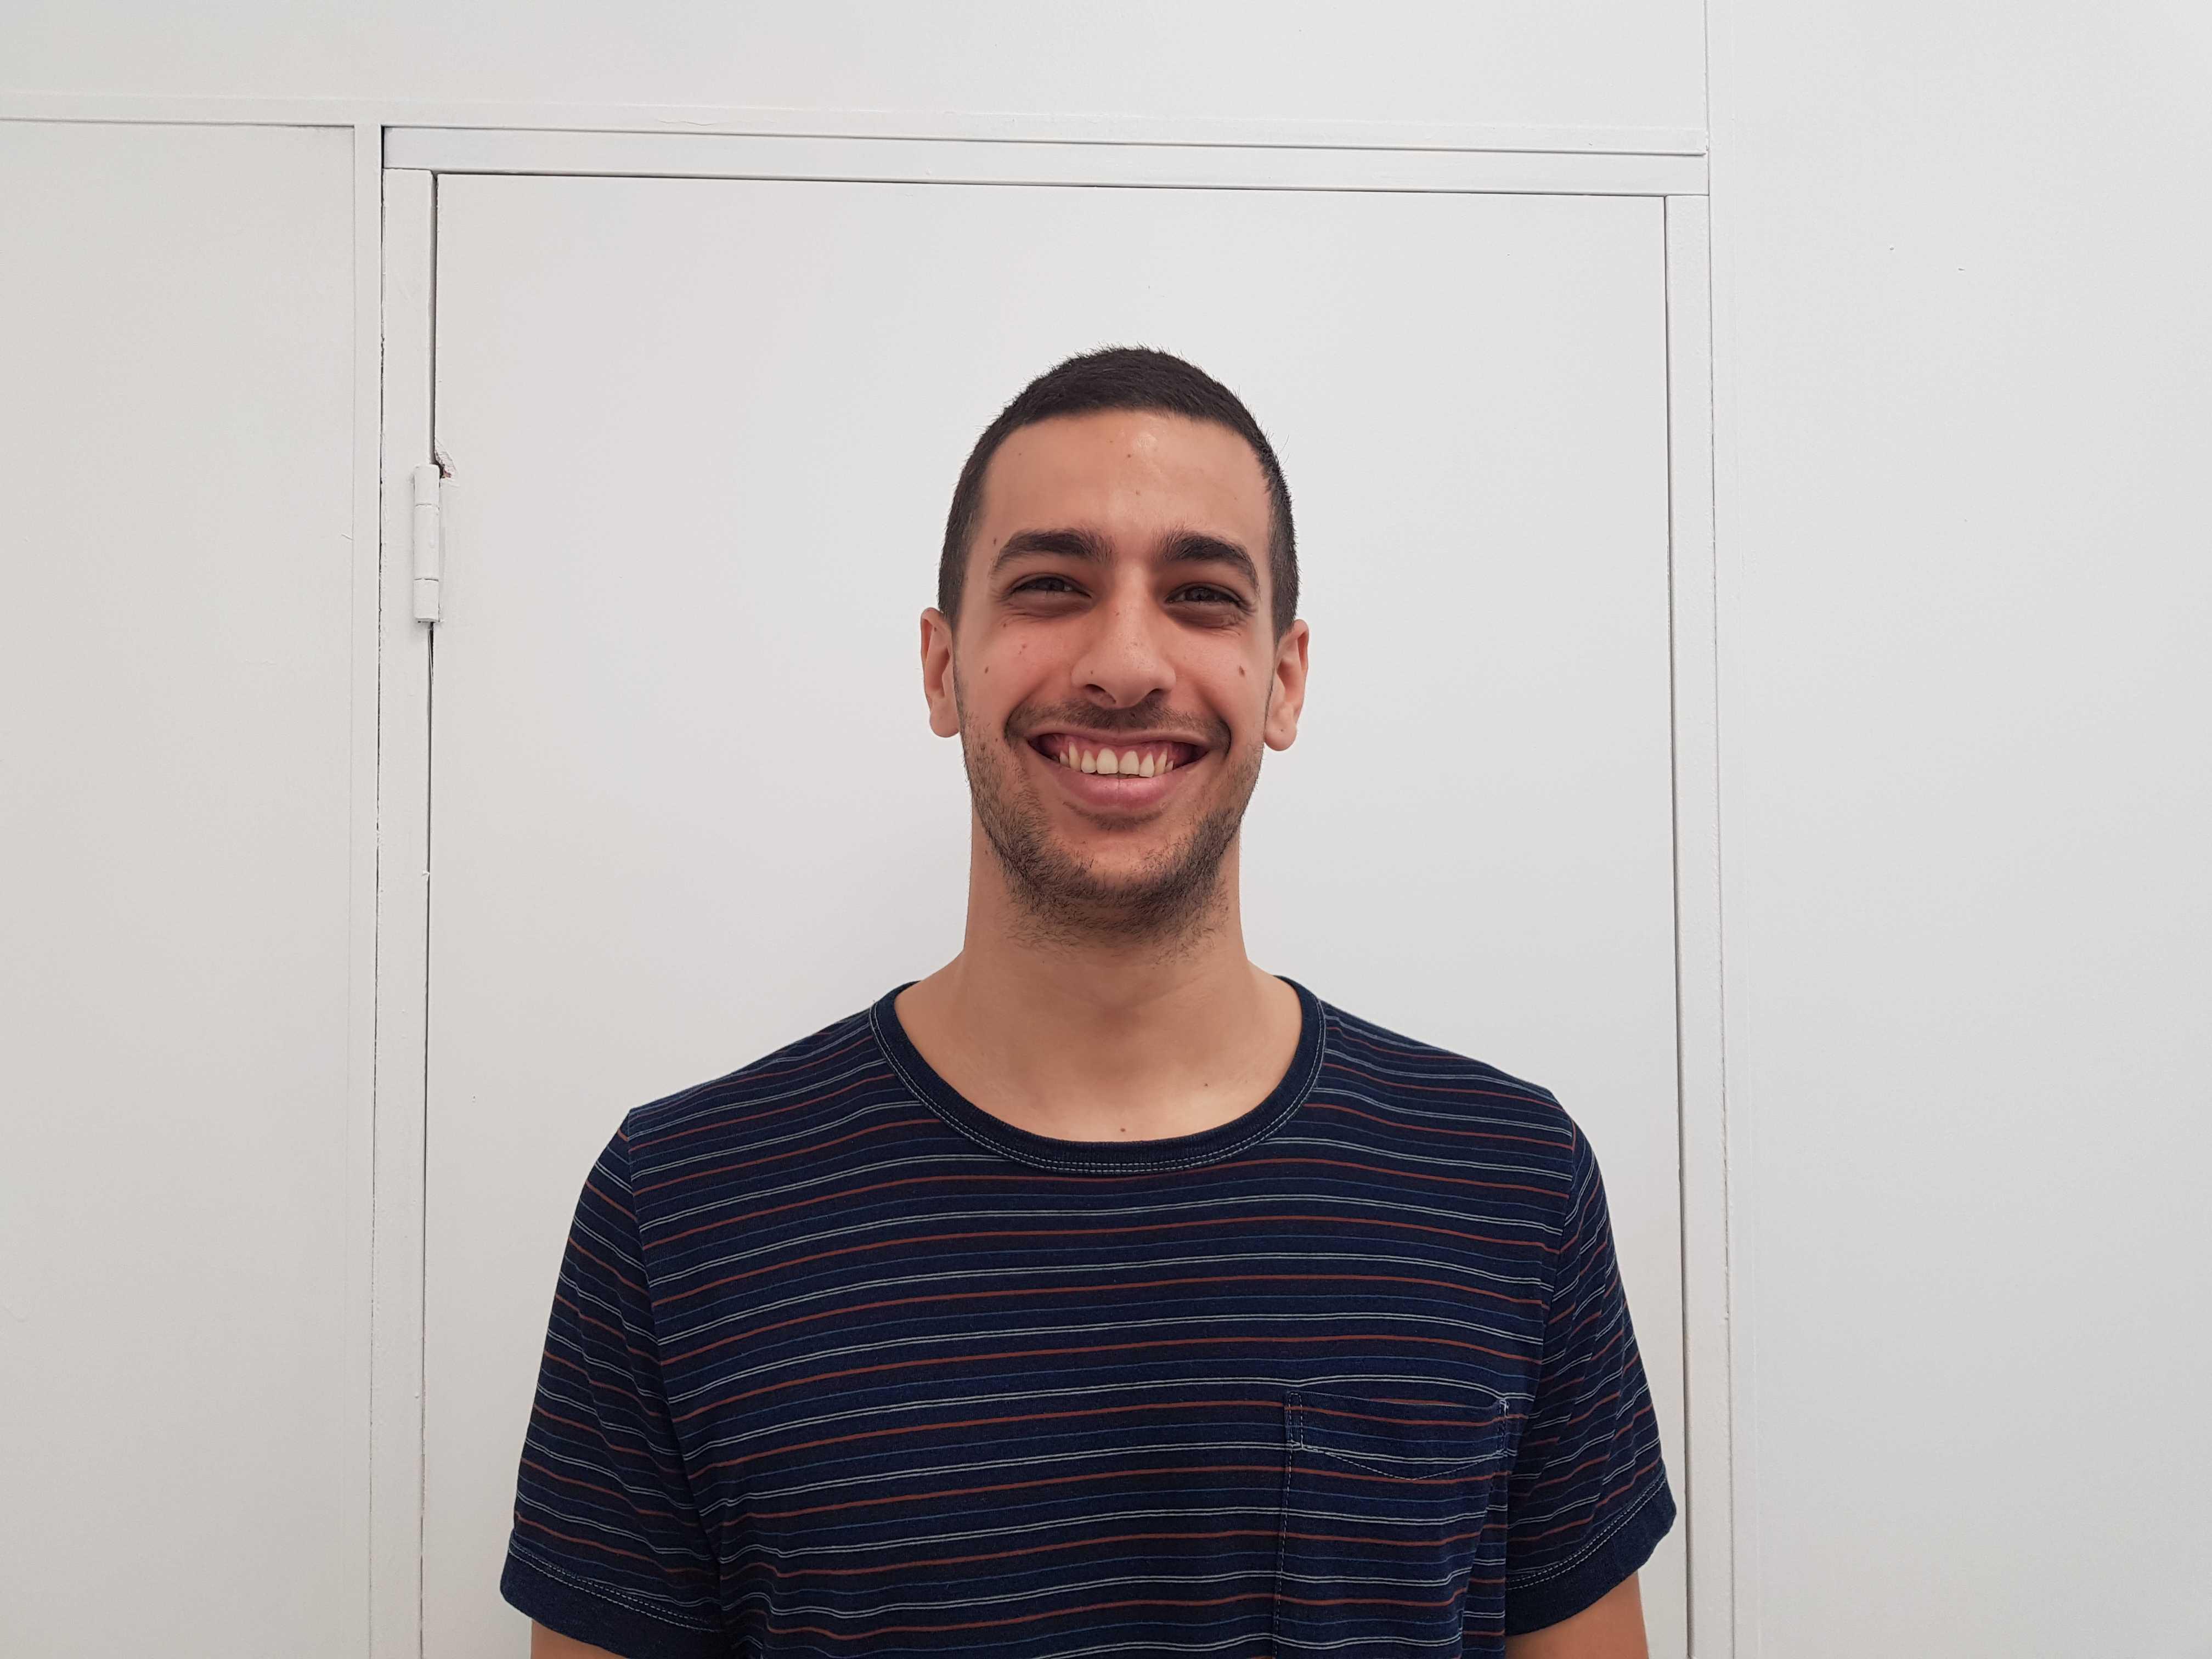 Alvaro-Medina